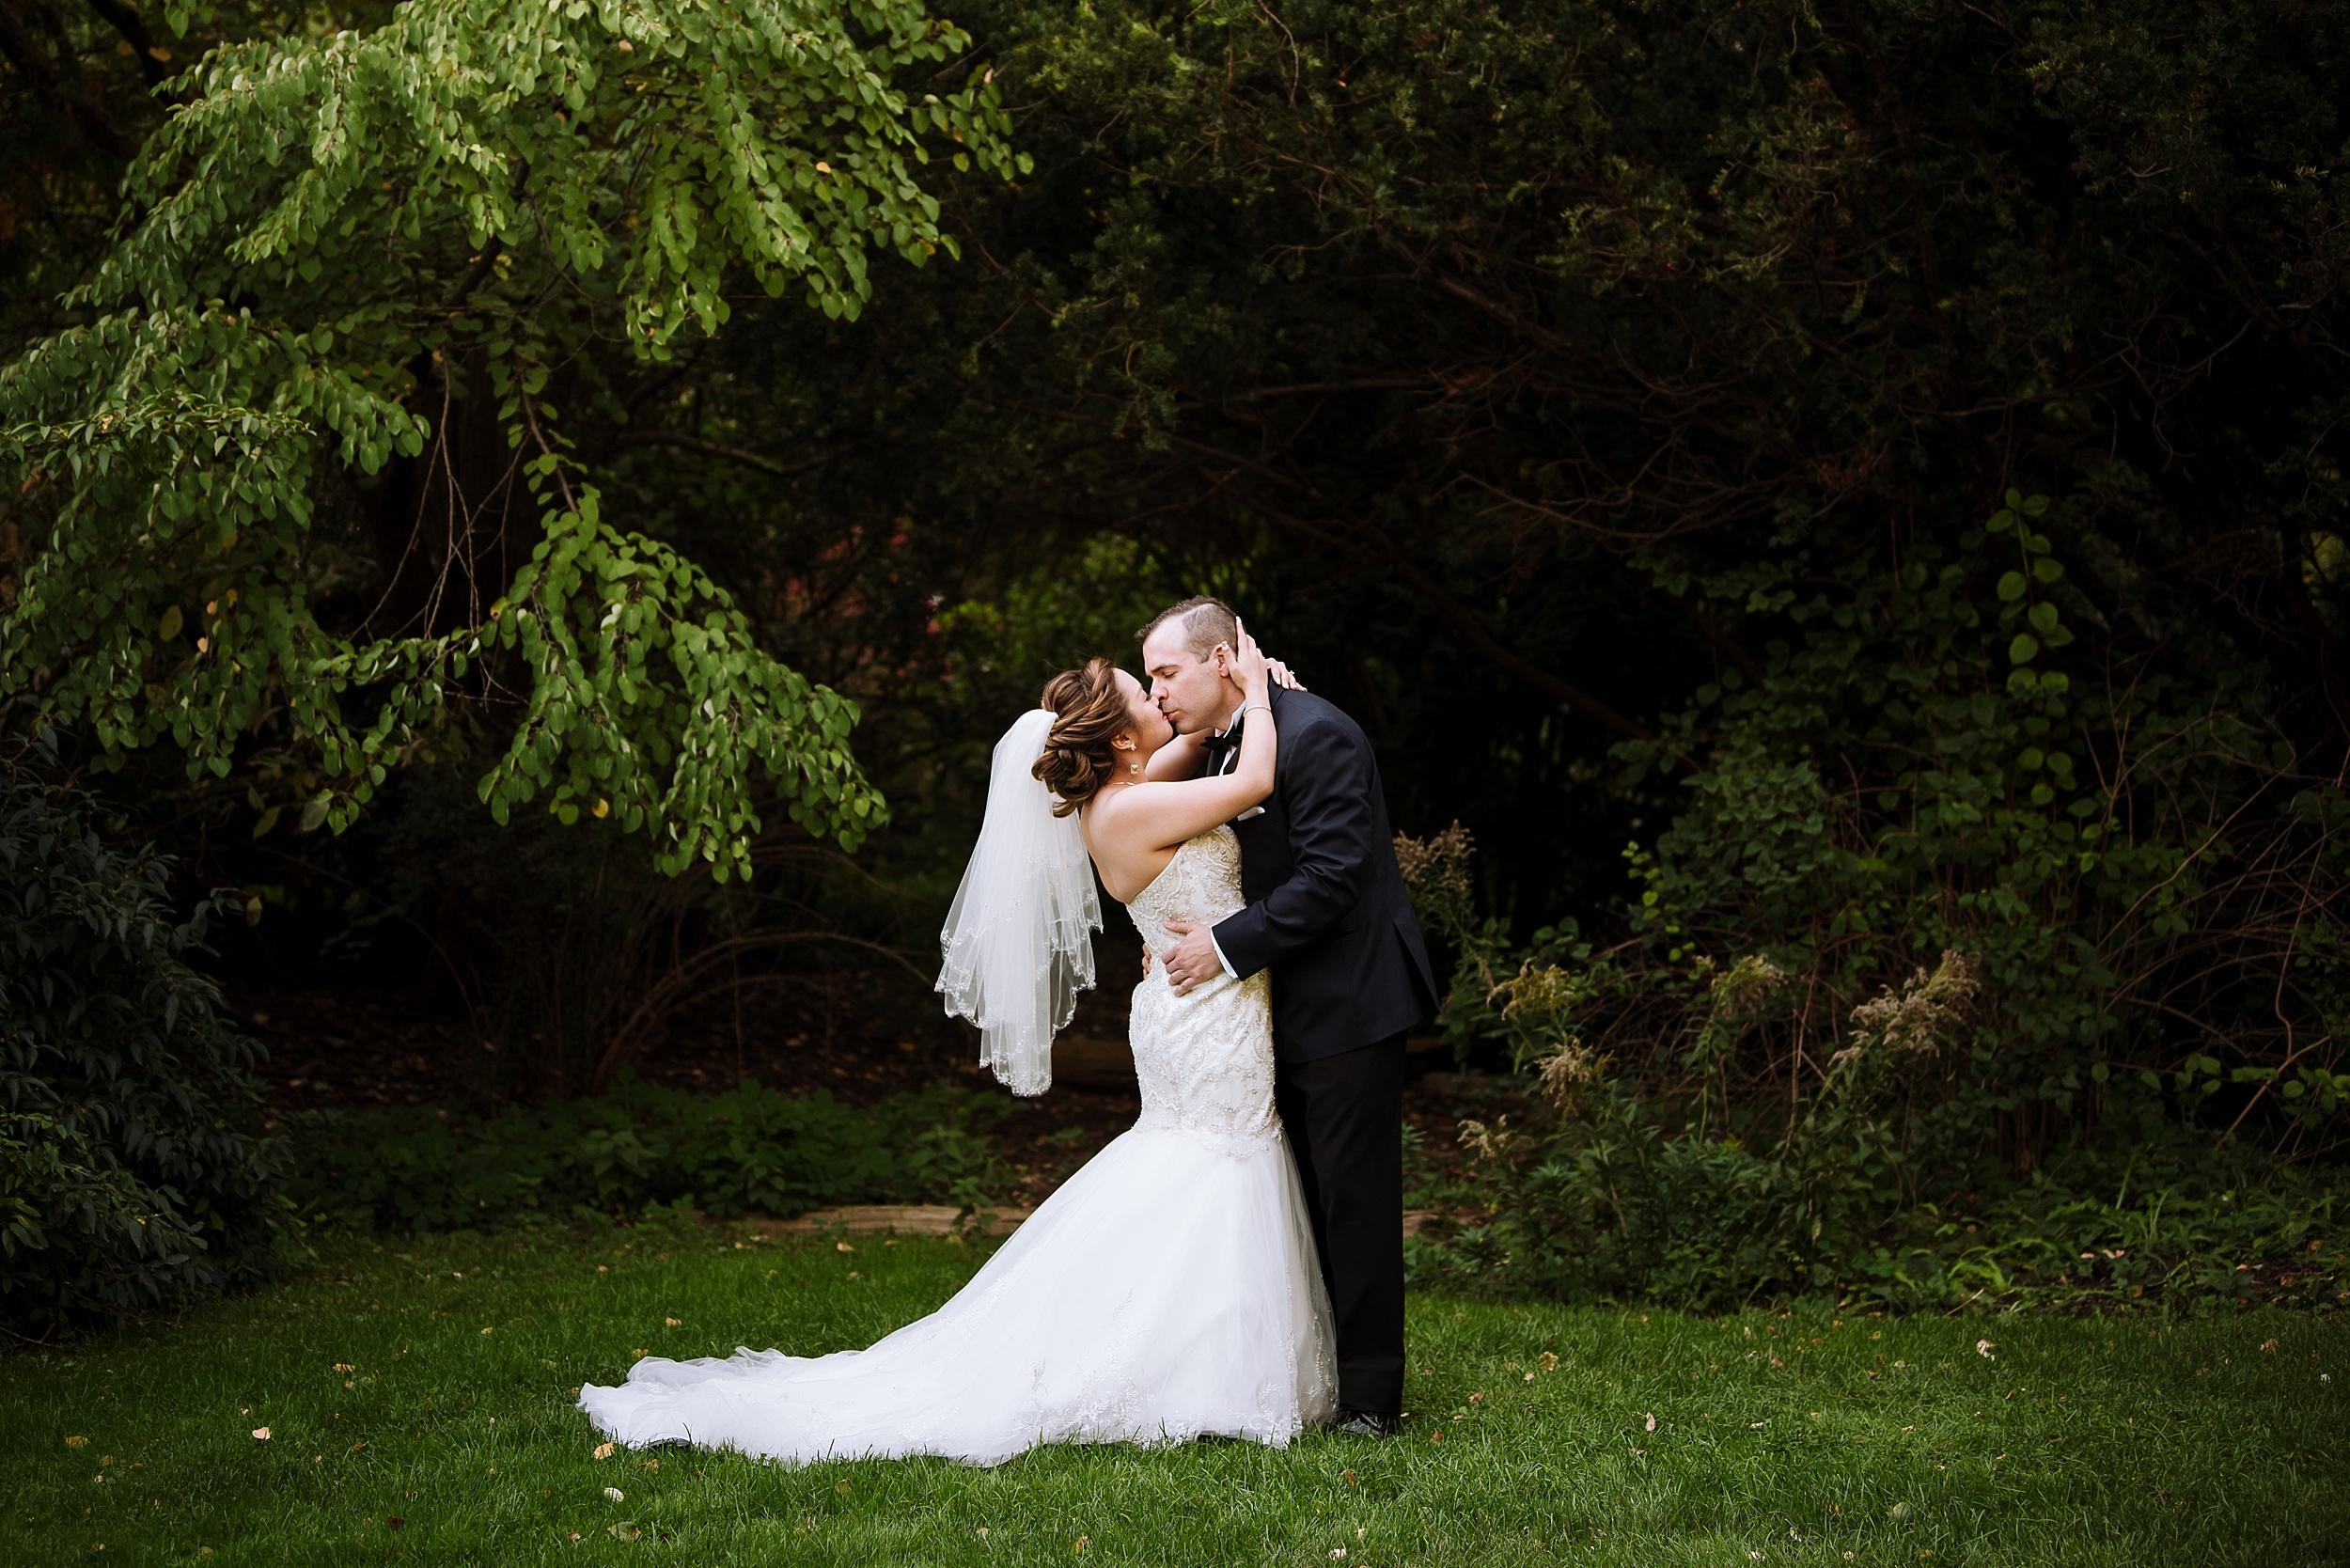 Sunnybrook_Estates_Alexander_Muir_Toronto_Wedding_Photographer_0020.jpg